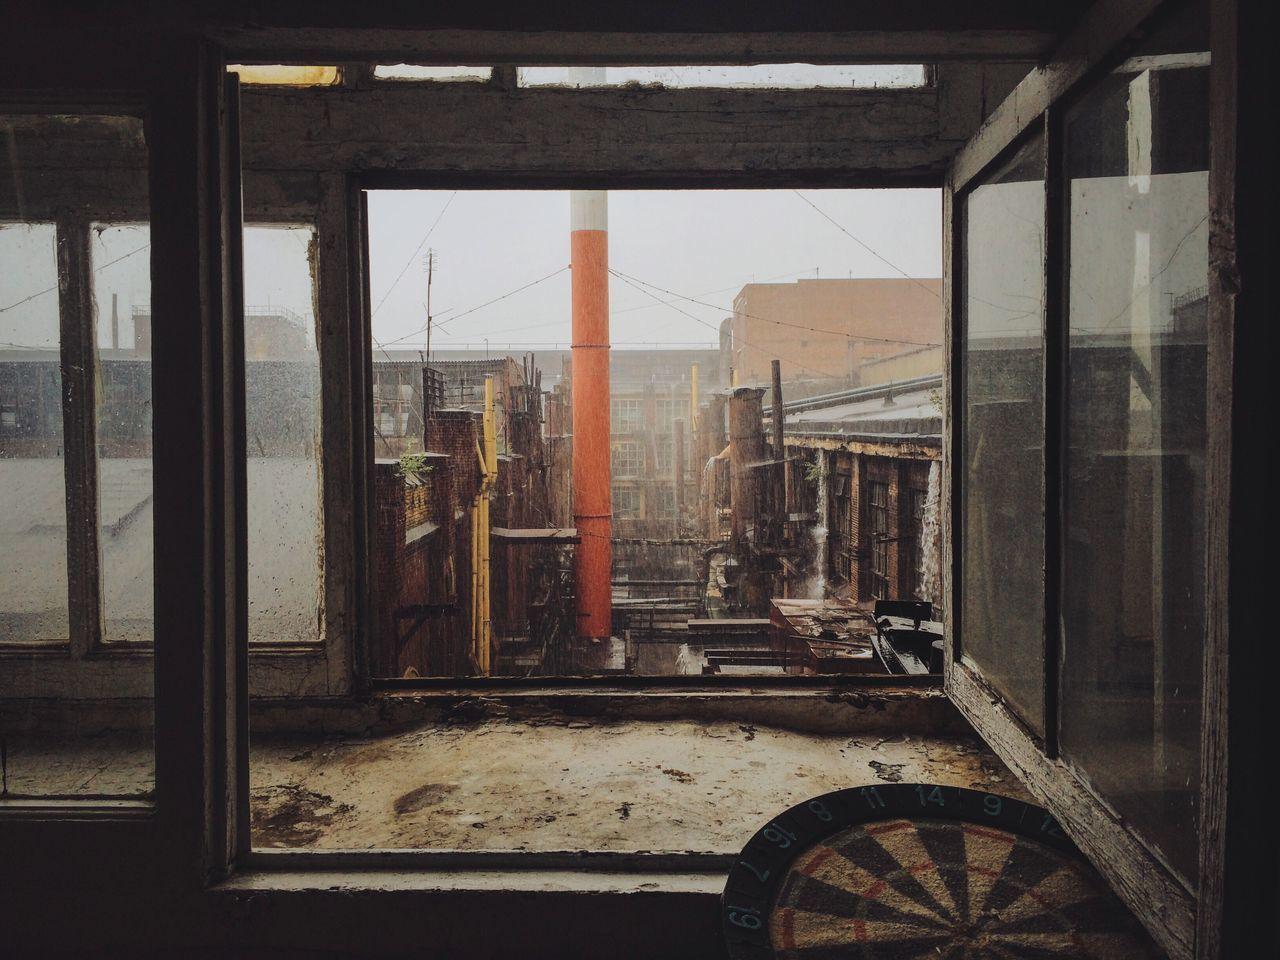 VIEW OF CITY THROUGH WINDOW